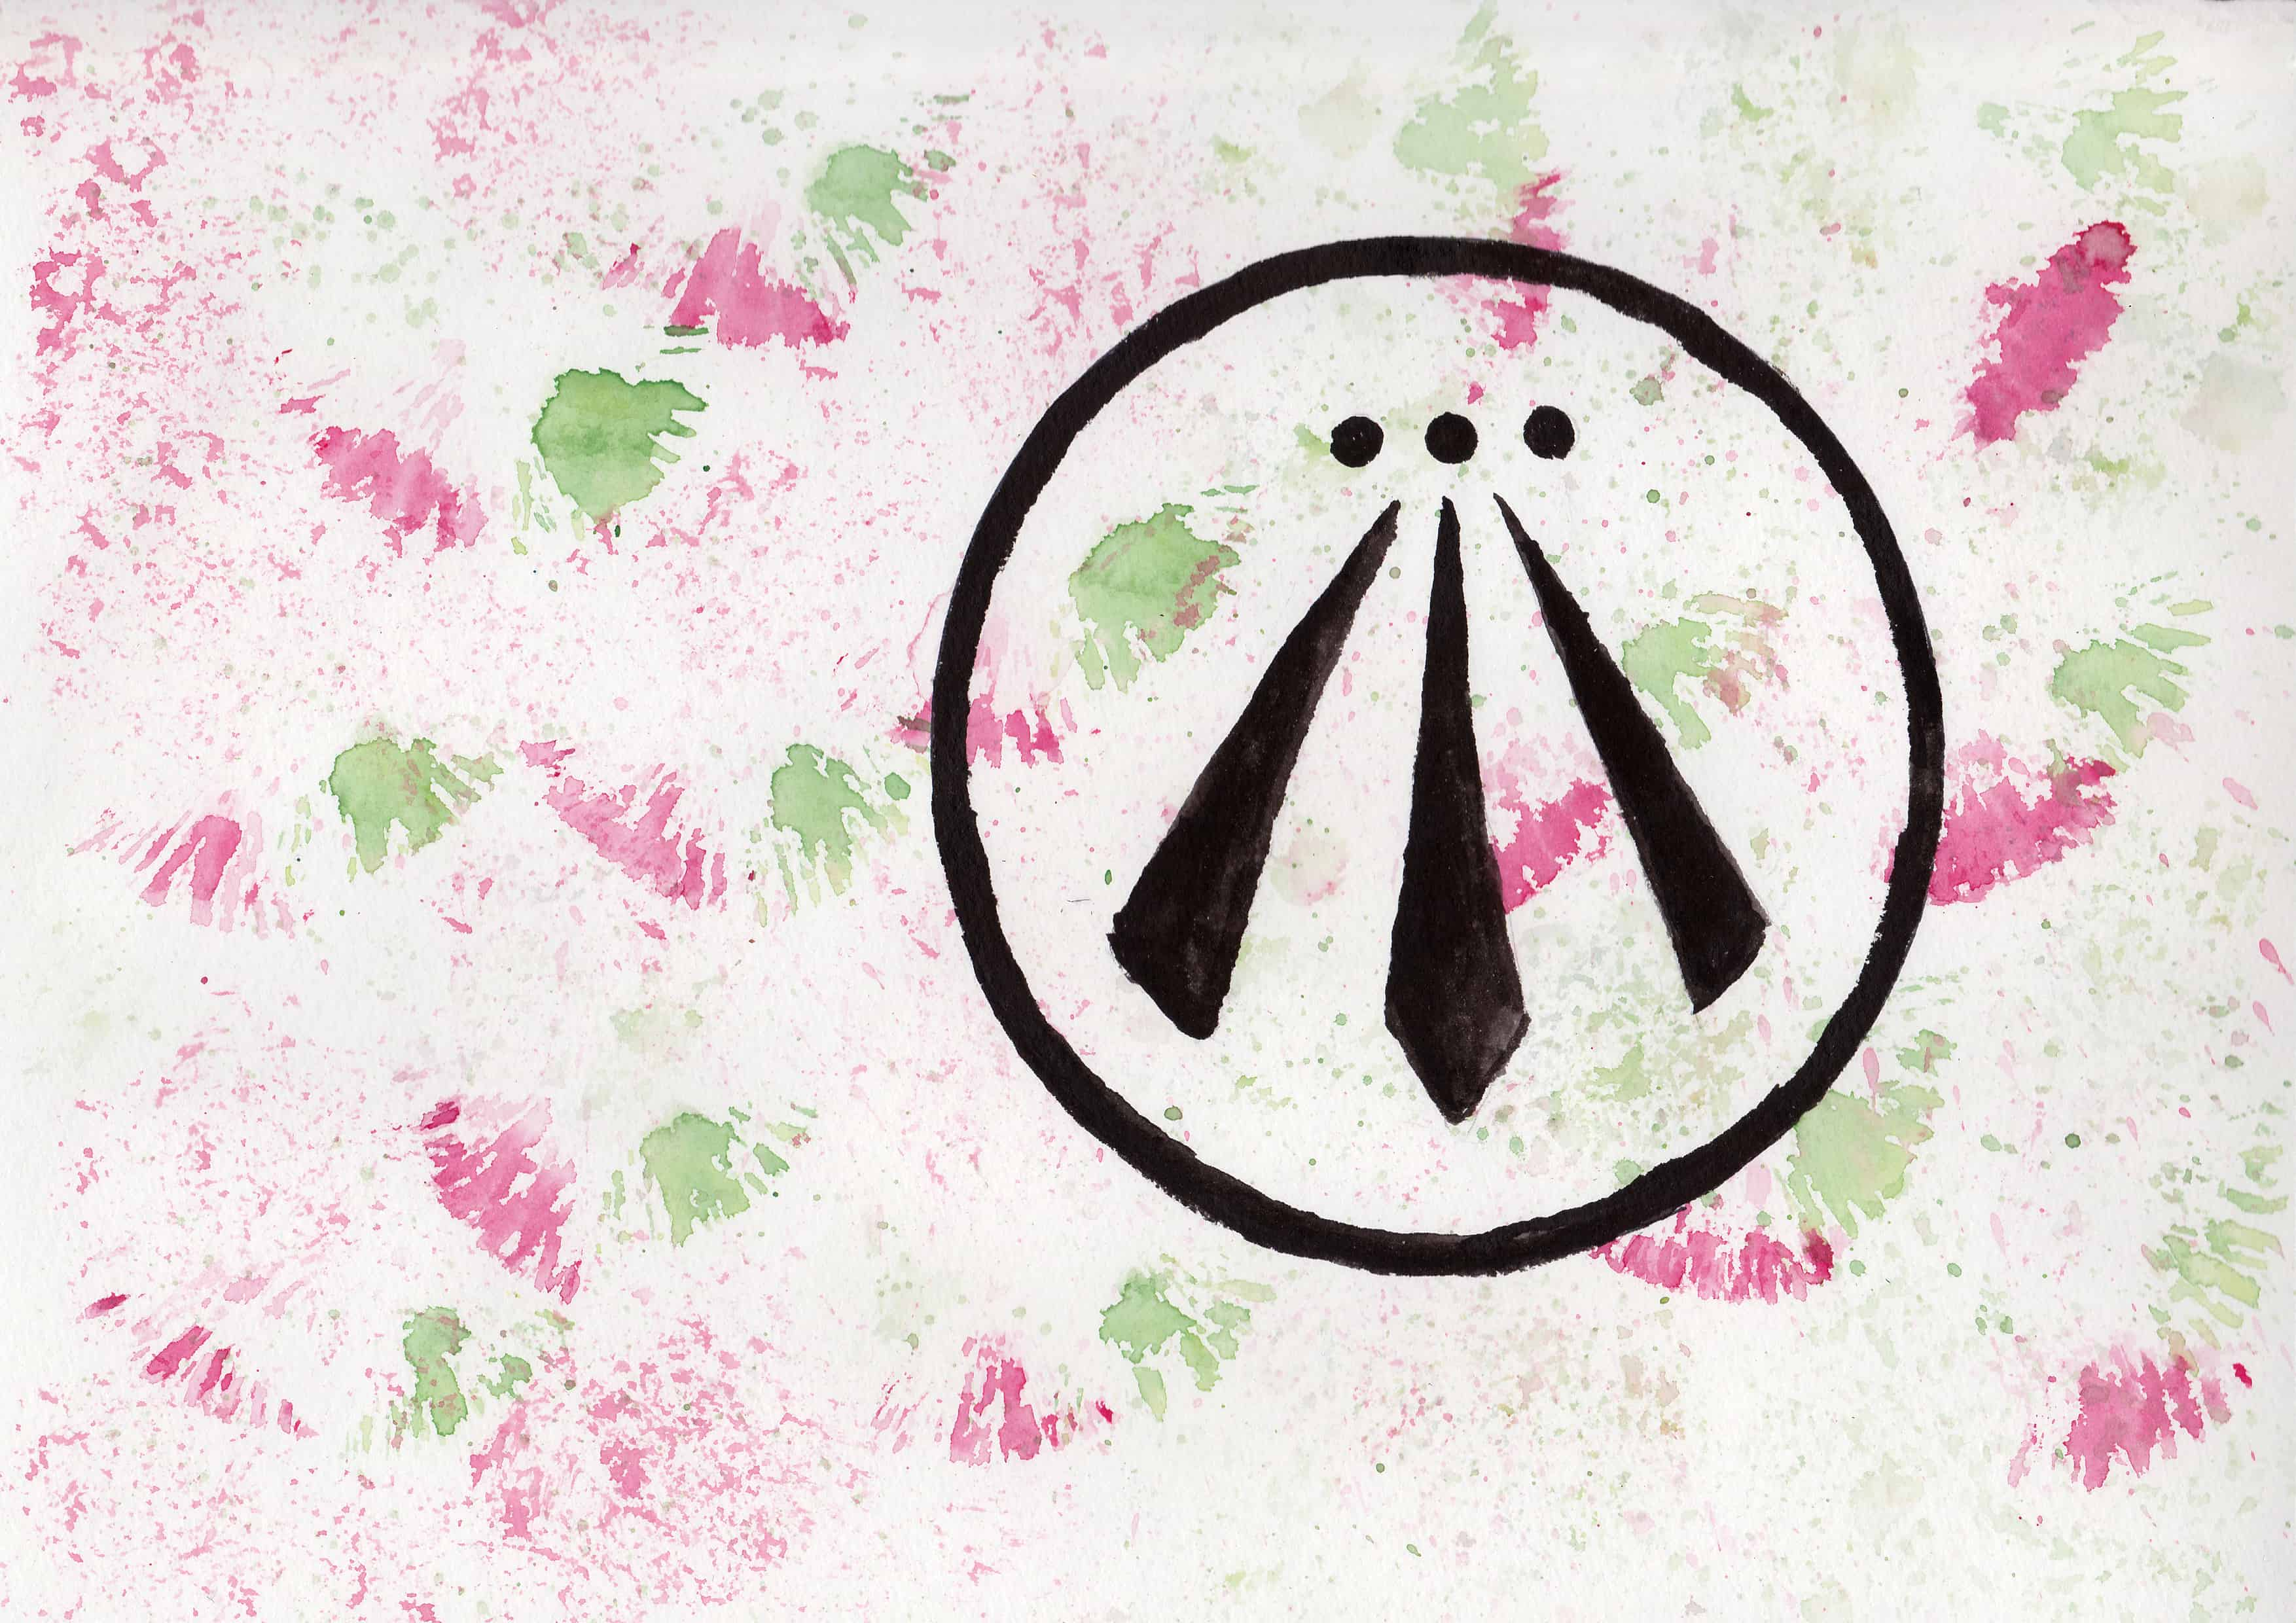 Awen - 100 Sacred Symbols in Watercolour by Linda Ursin